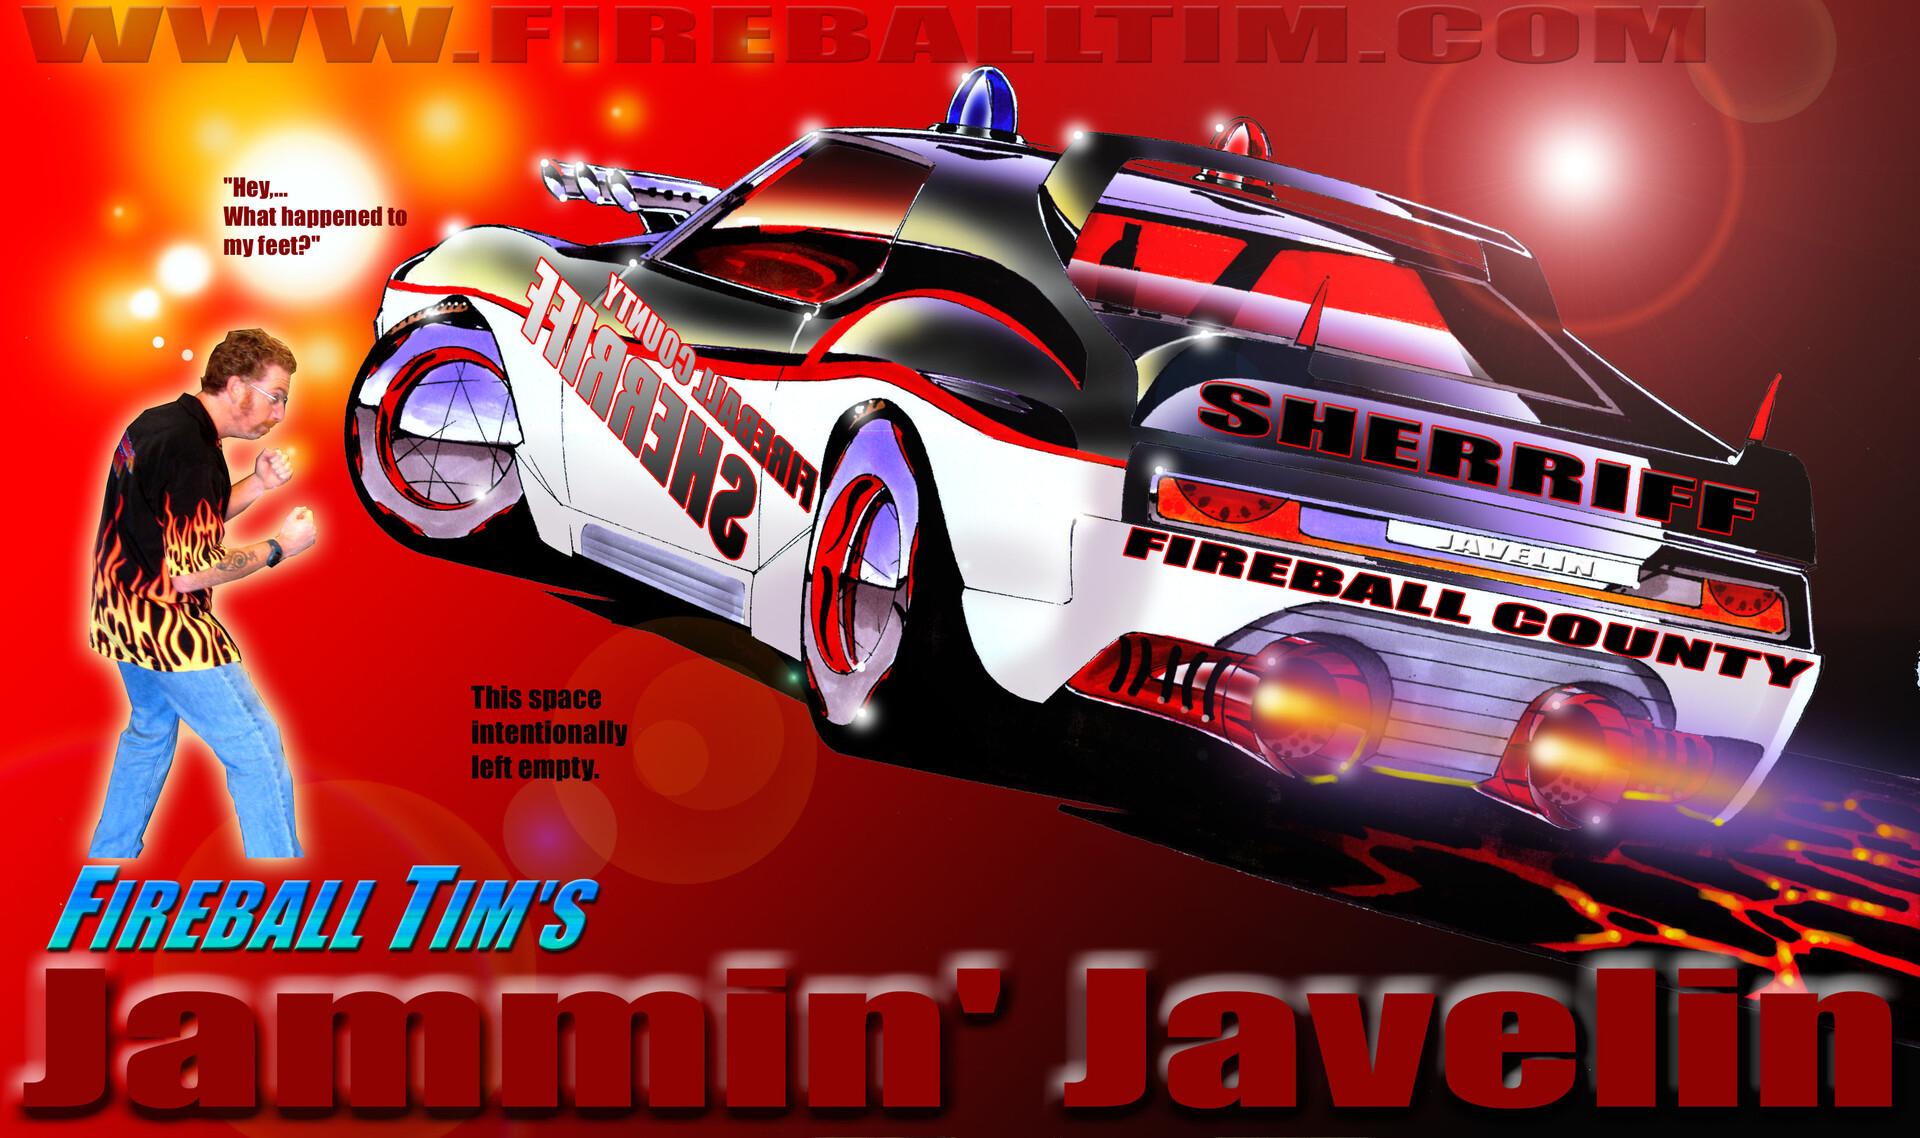 Jammin' Javelin - Client -FUNRISE